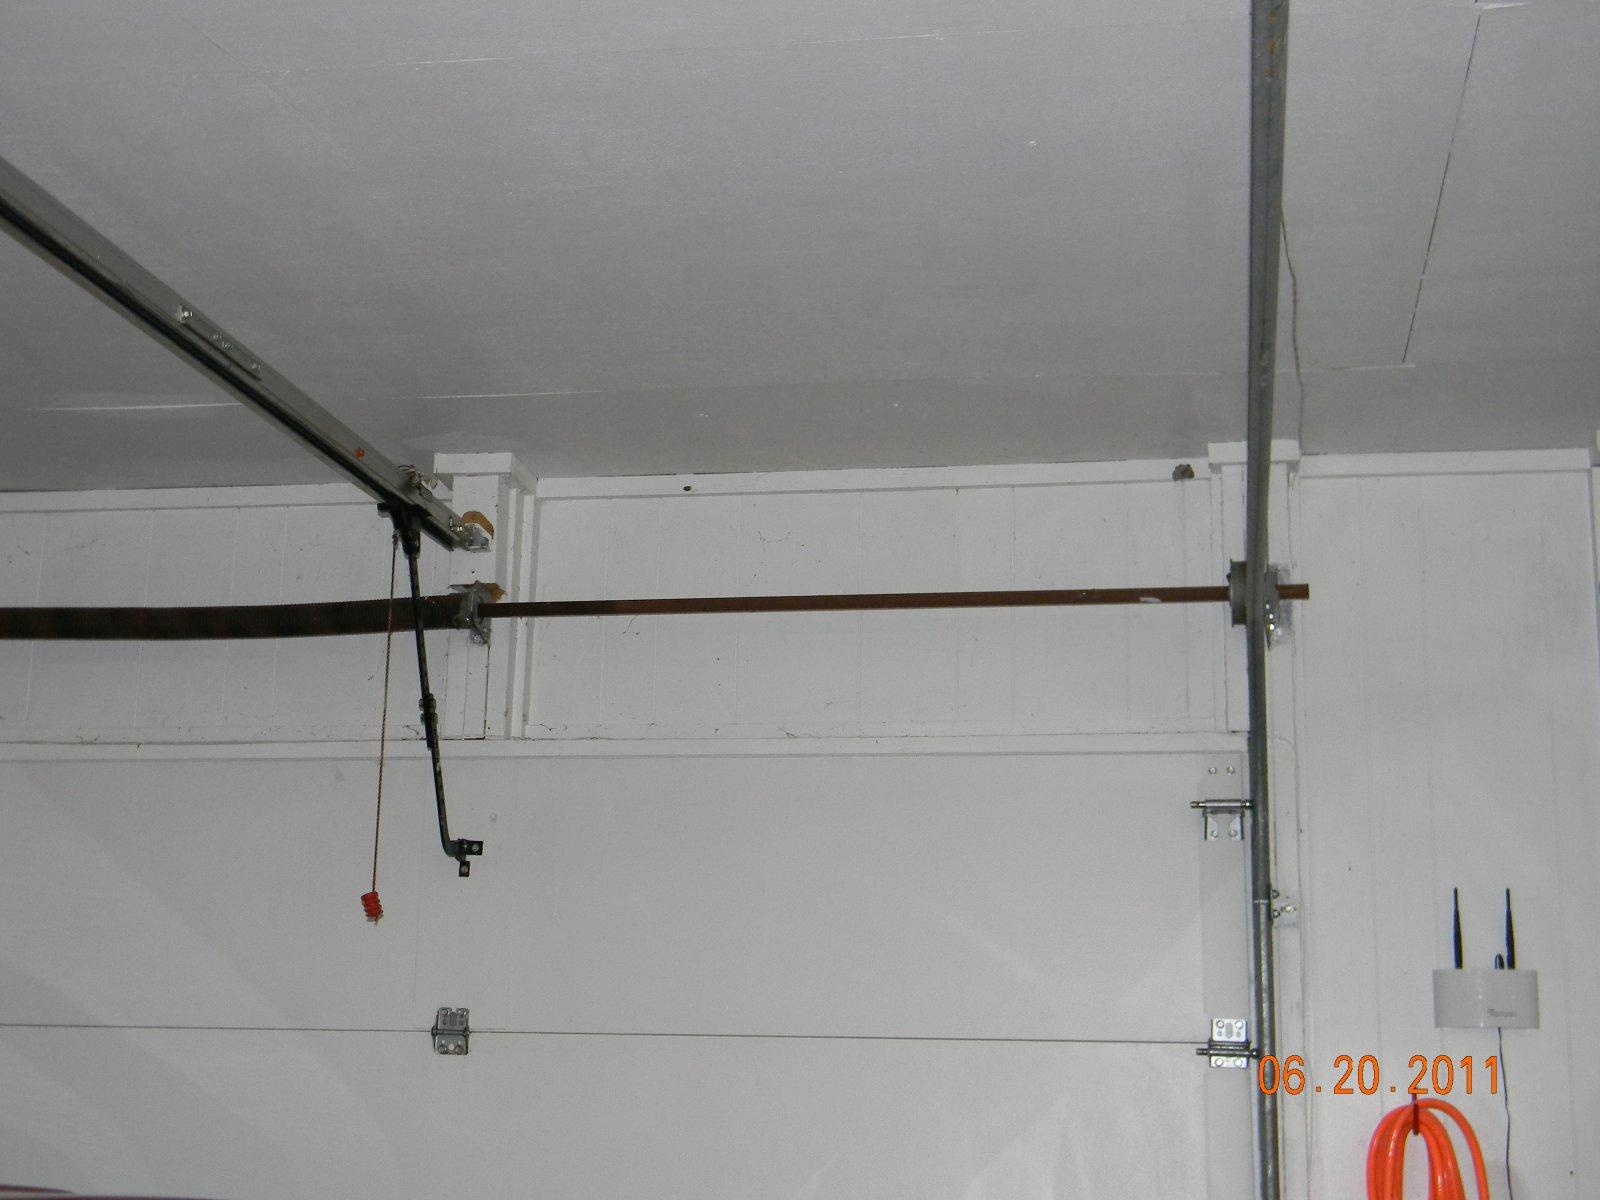 Click image for larger version  Name:garage June 2011 002.jpg Views:44 Size:163.3 KB ID:11391